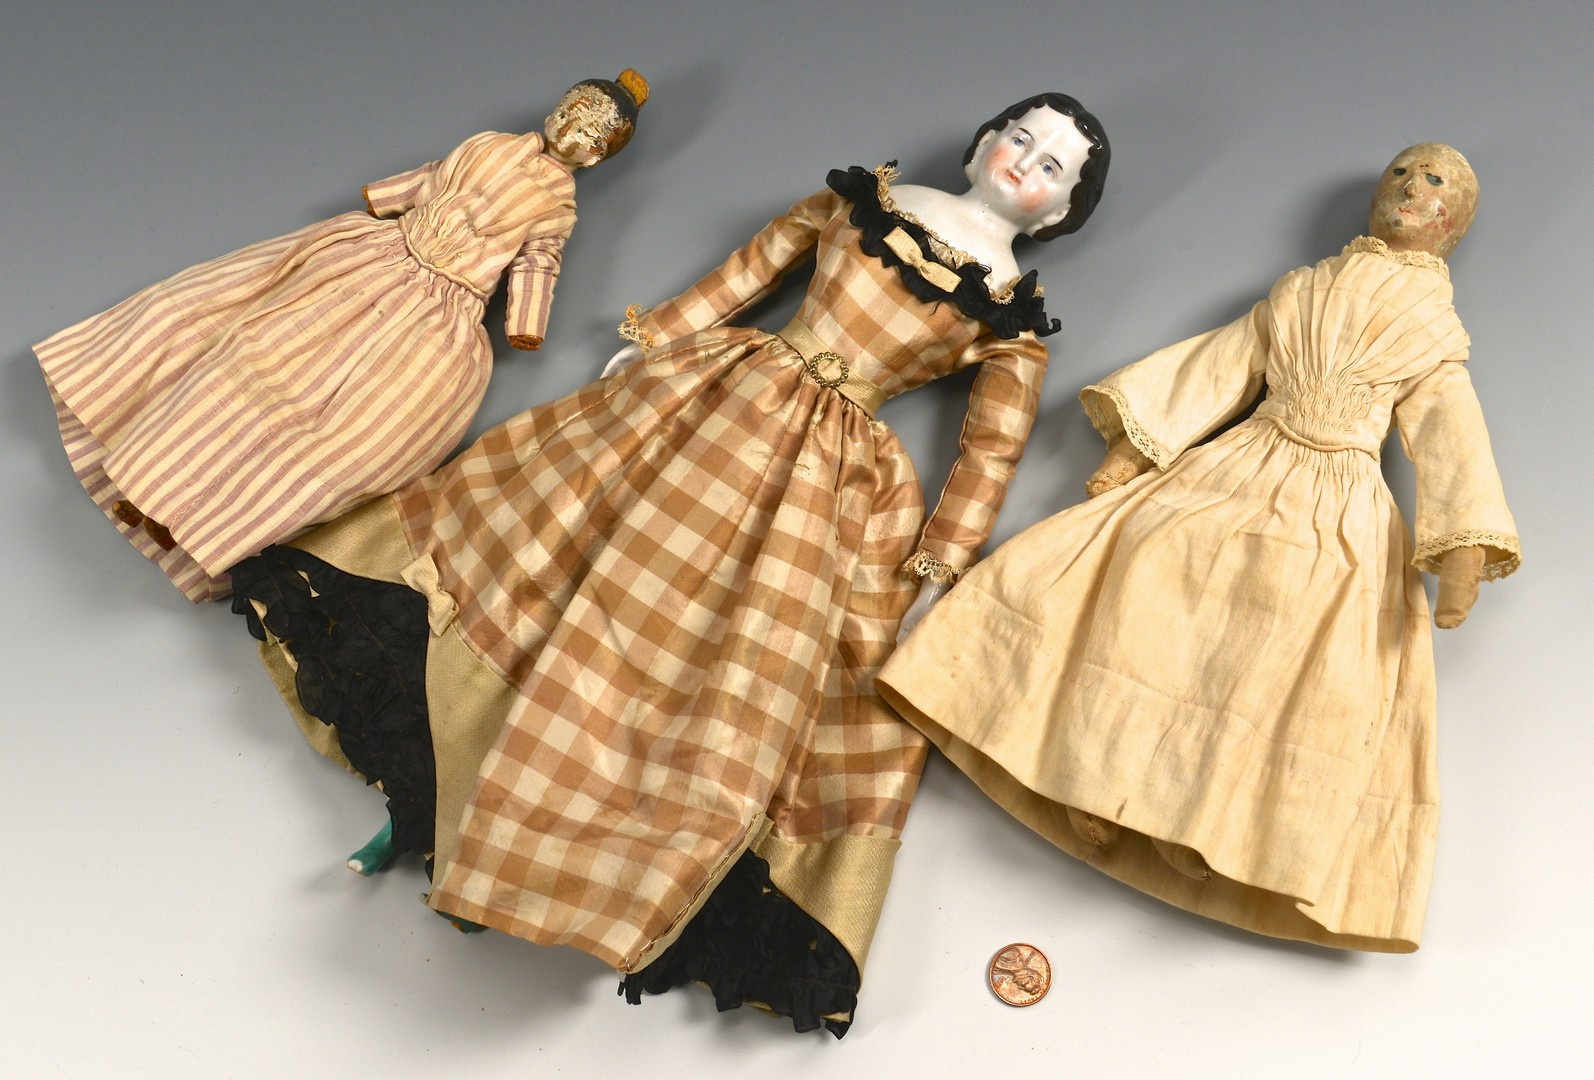 Lot 851: 19th Century Dolls: 1 porcelain, 2 wood